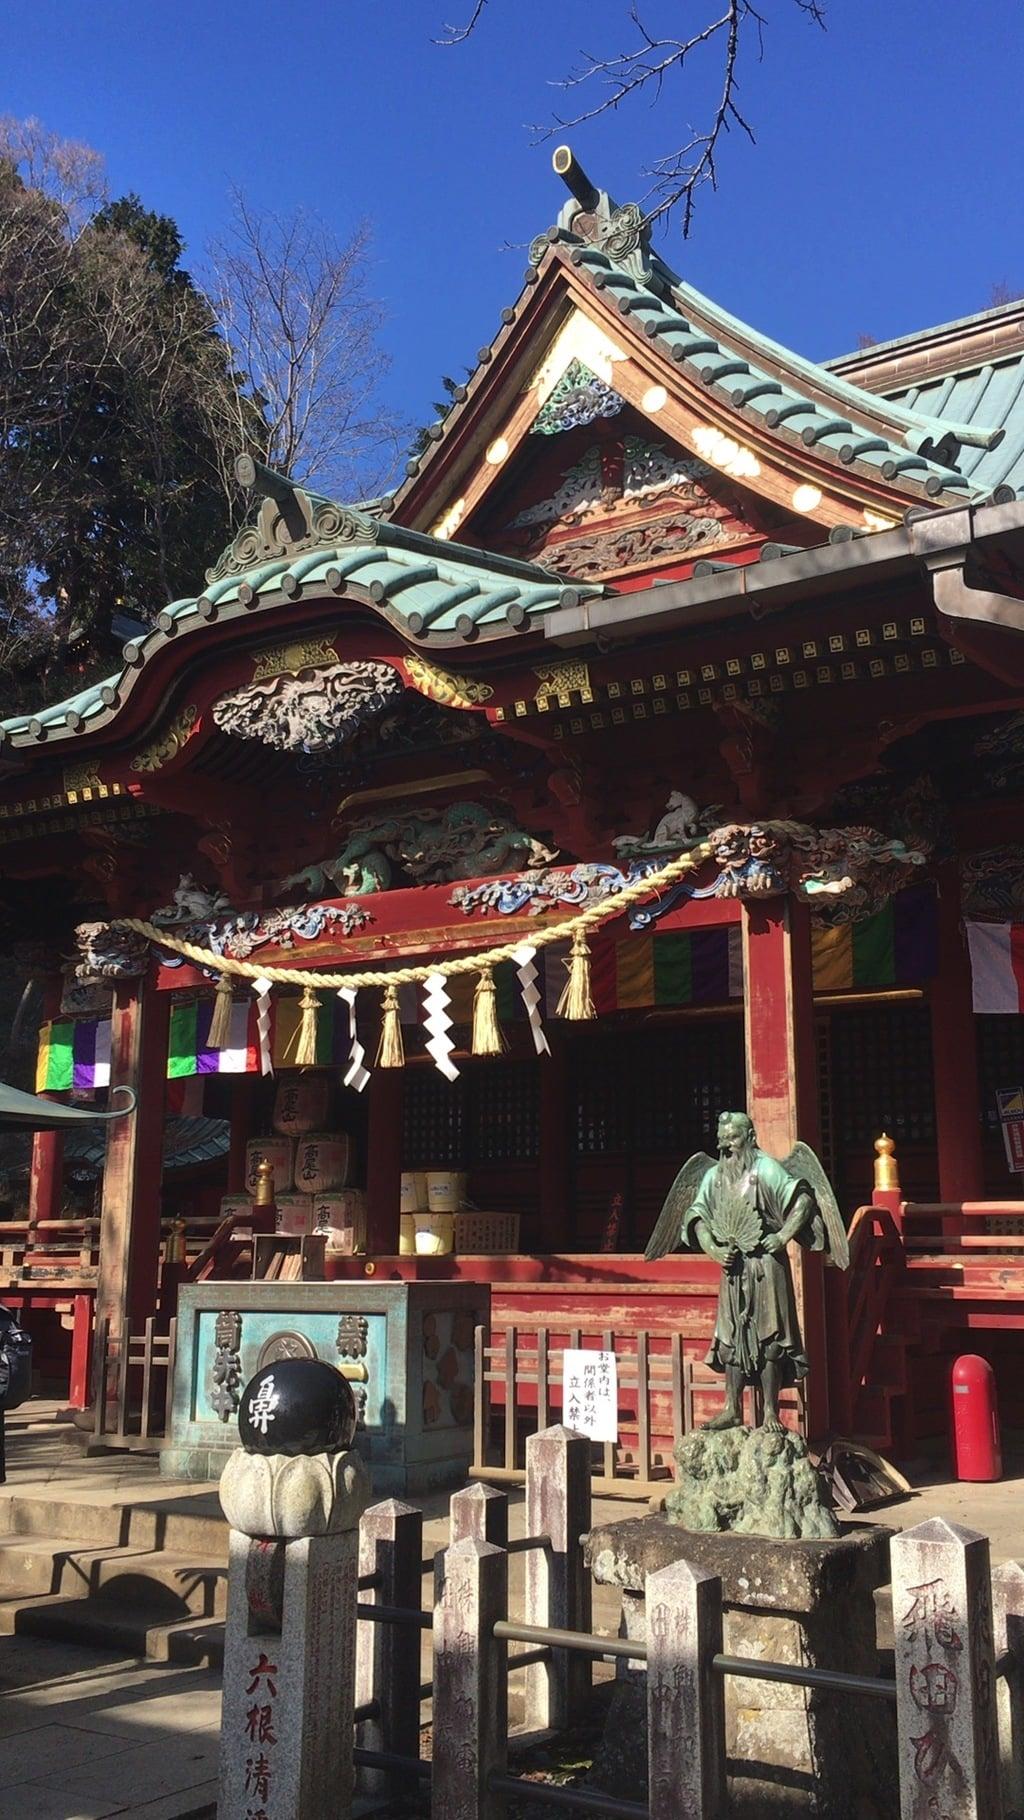 高尾山薬王院の本殿